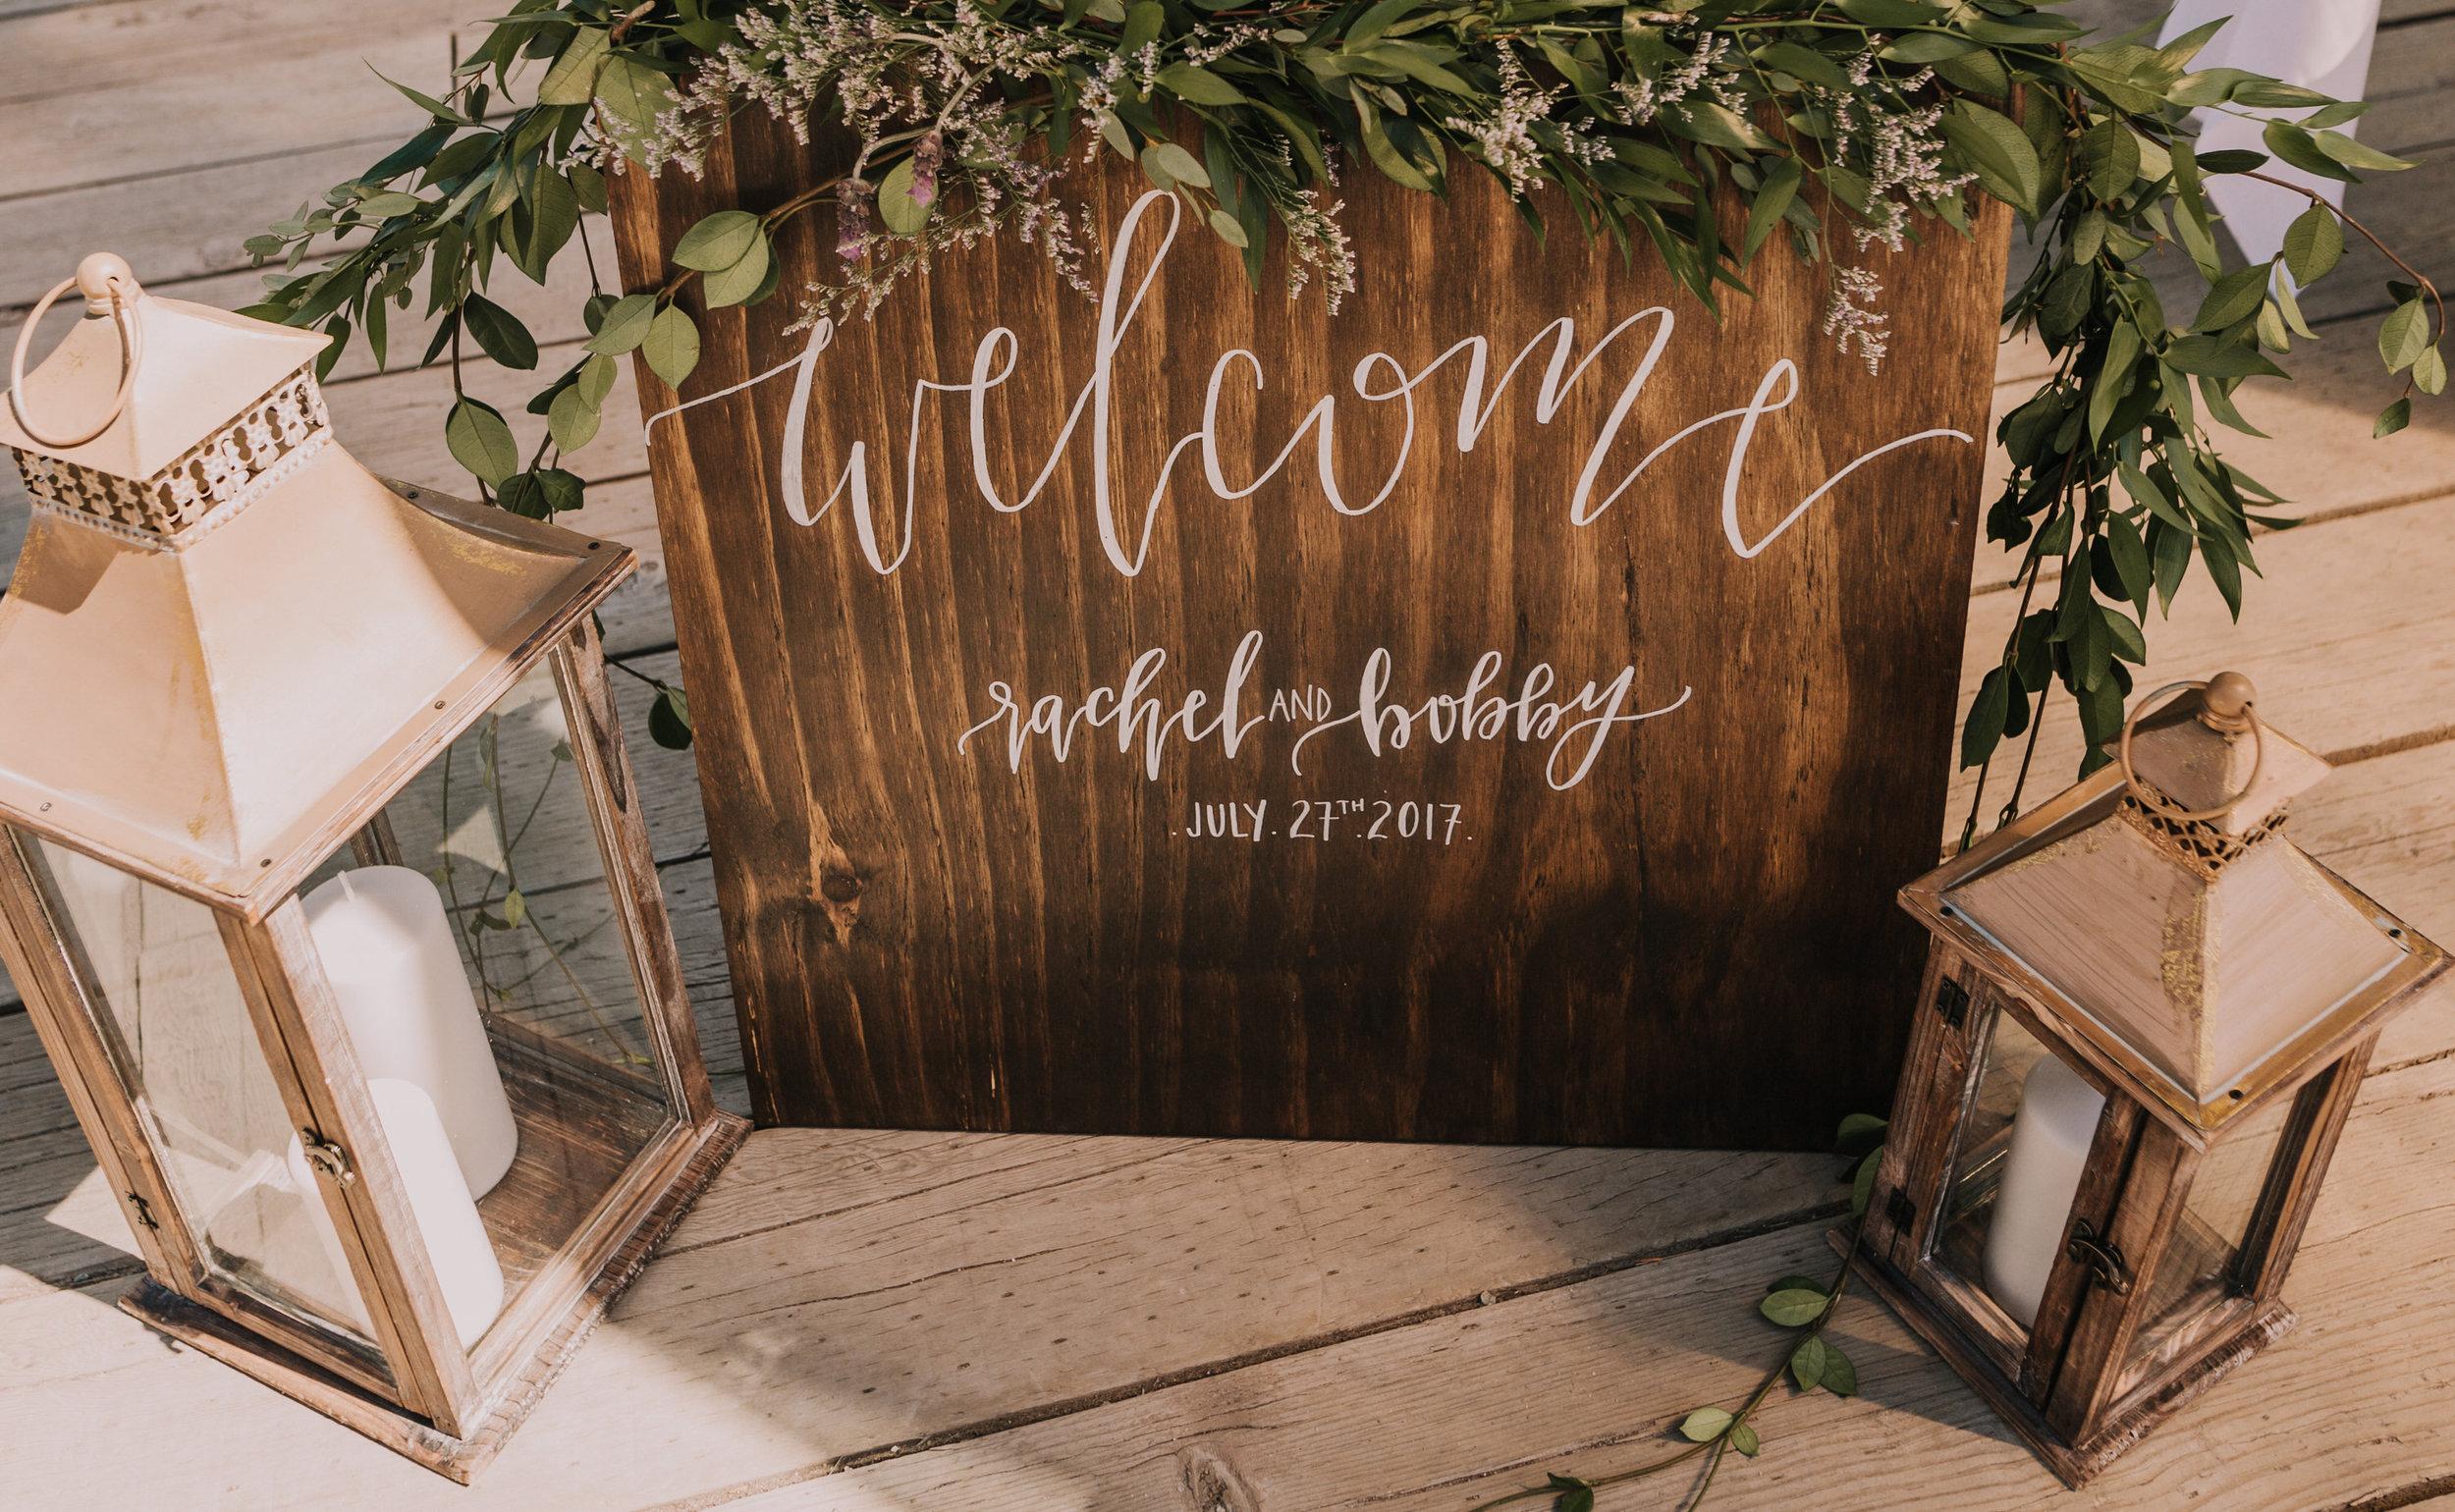 Squamish Wedding Photographer - Sea to Sky Gondola Wedding Photos -  Vancouver Wedding Photographer & Videographer - Sunshine Coast Wedding Photos - Sunshine Coast Wedding Photographer - Jennifer Picard Photography - DSCF6685.jpg